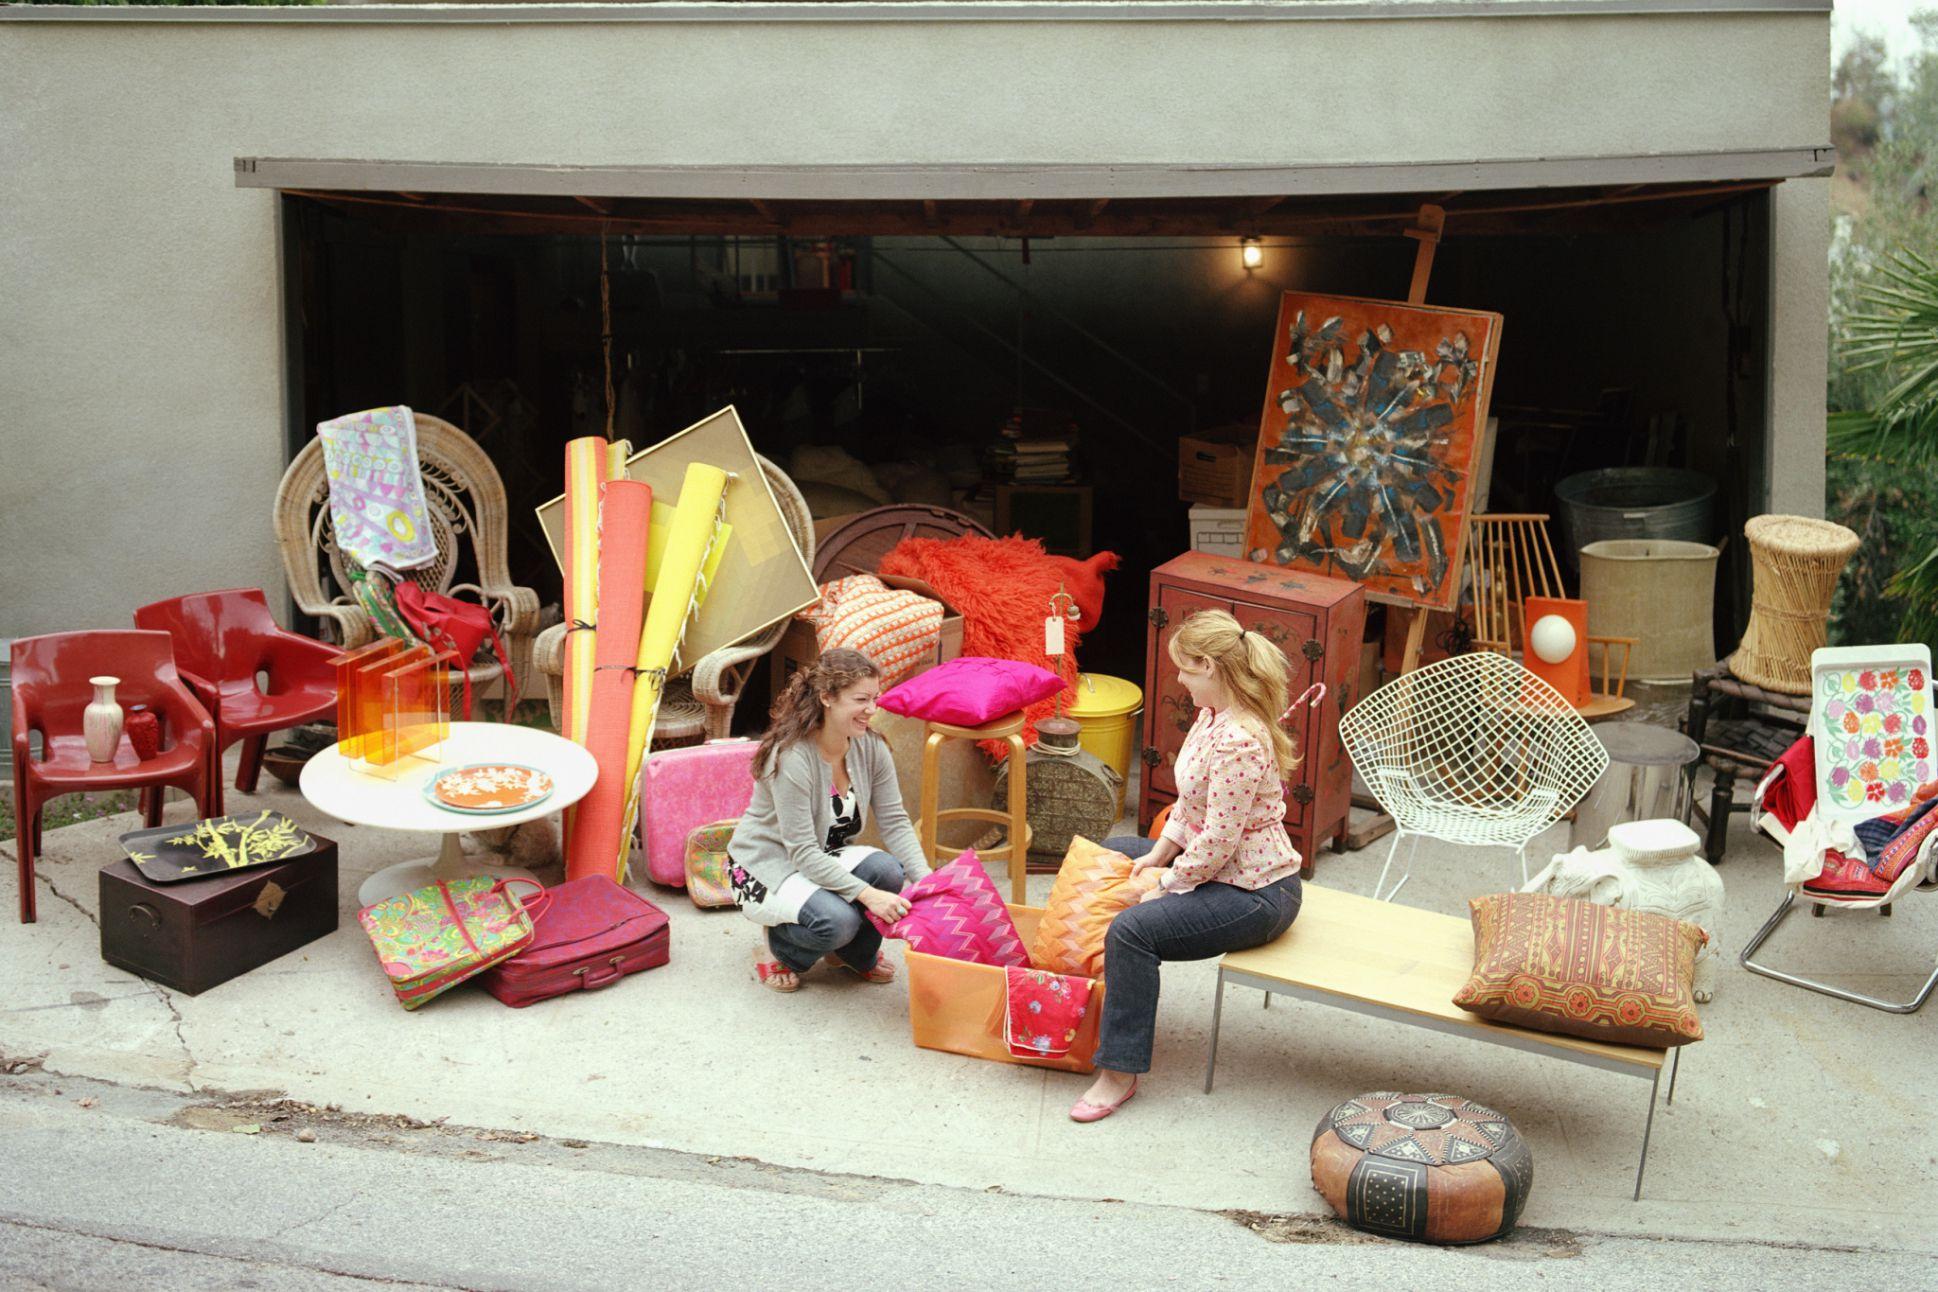 14 garage sale display ideas and tips - Vender garaje ...